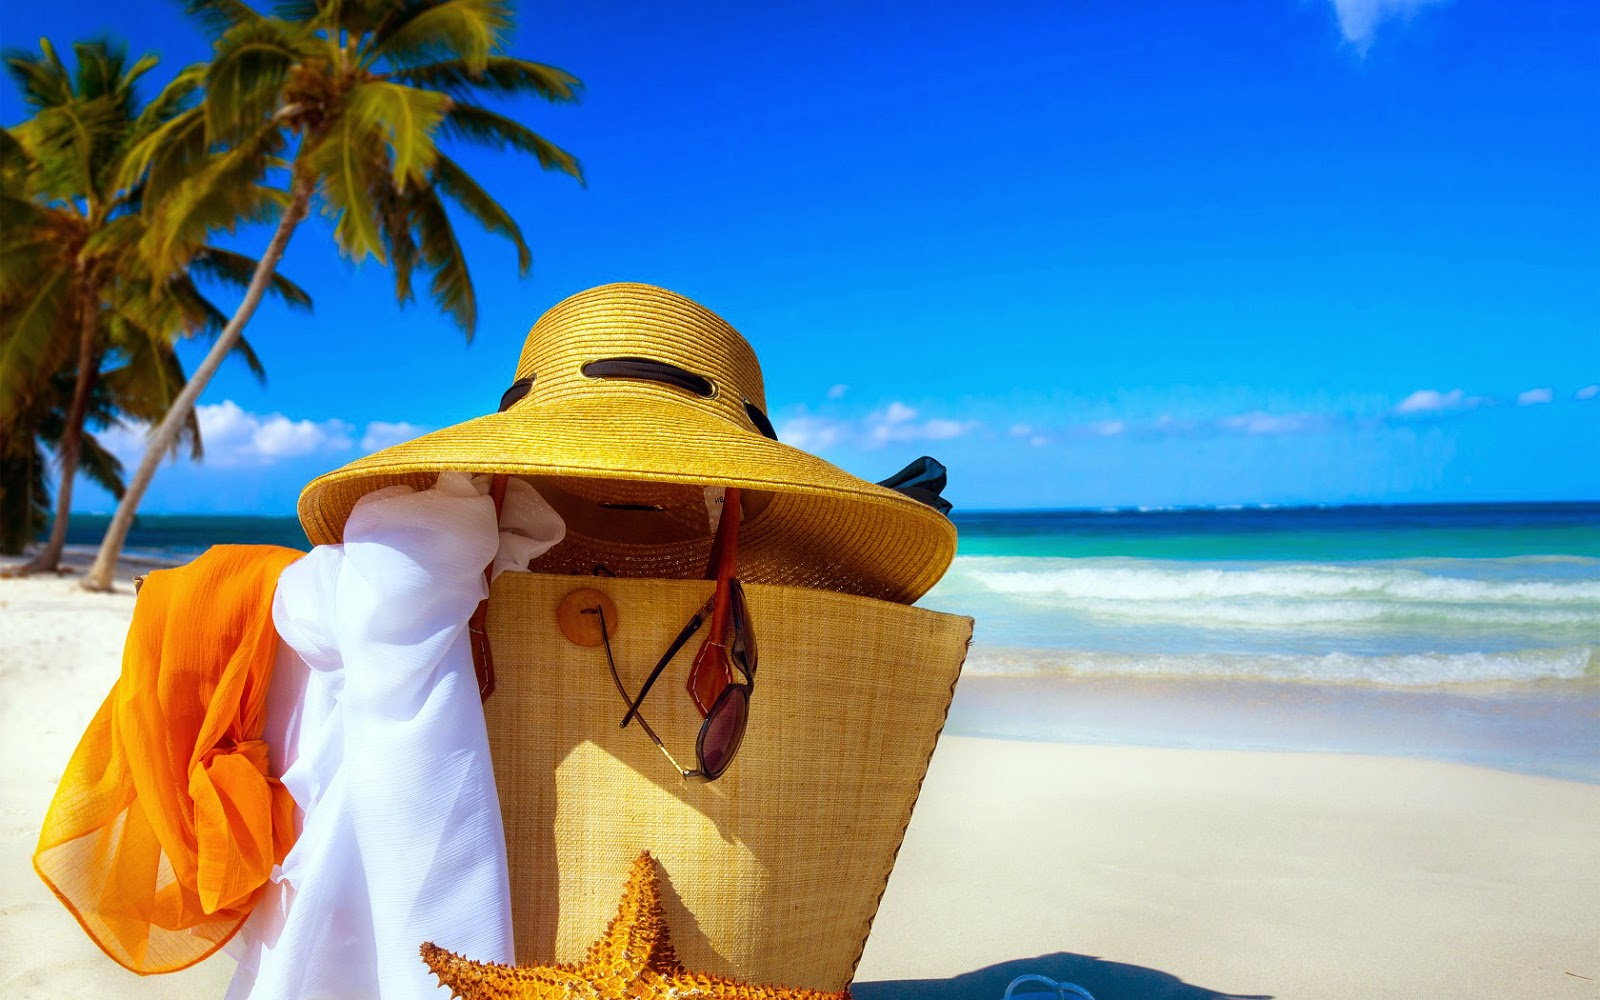 Strand, zee en strandspullen